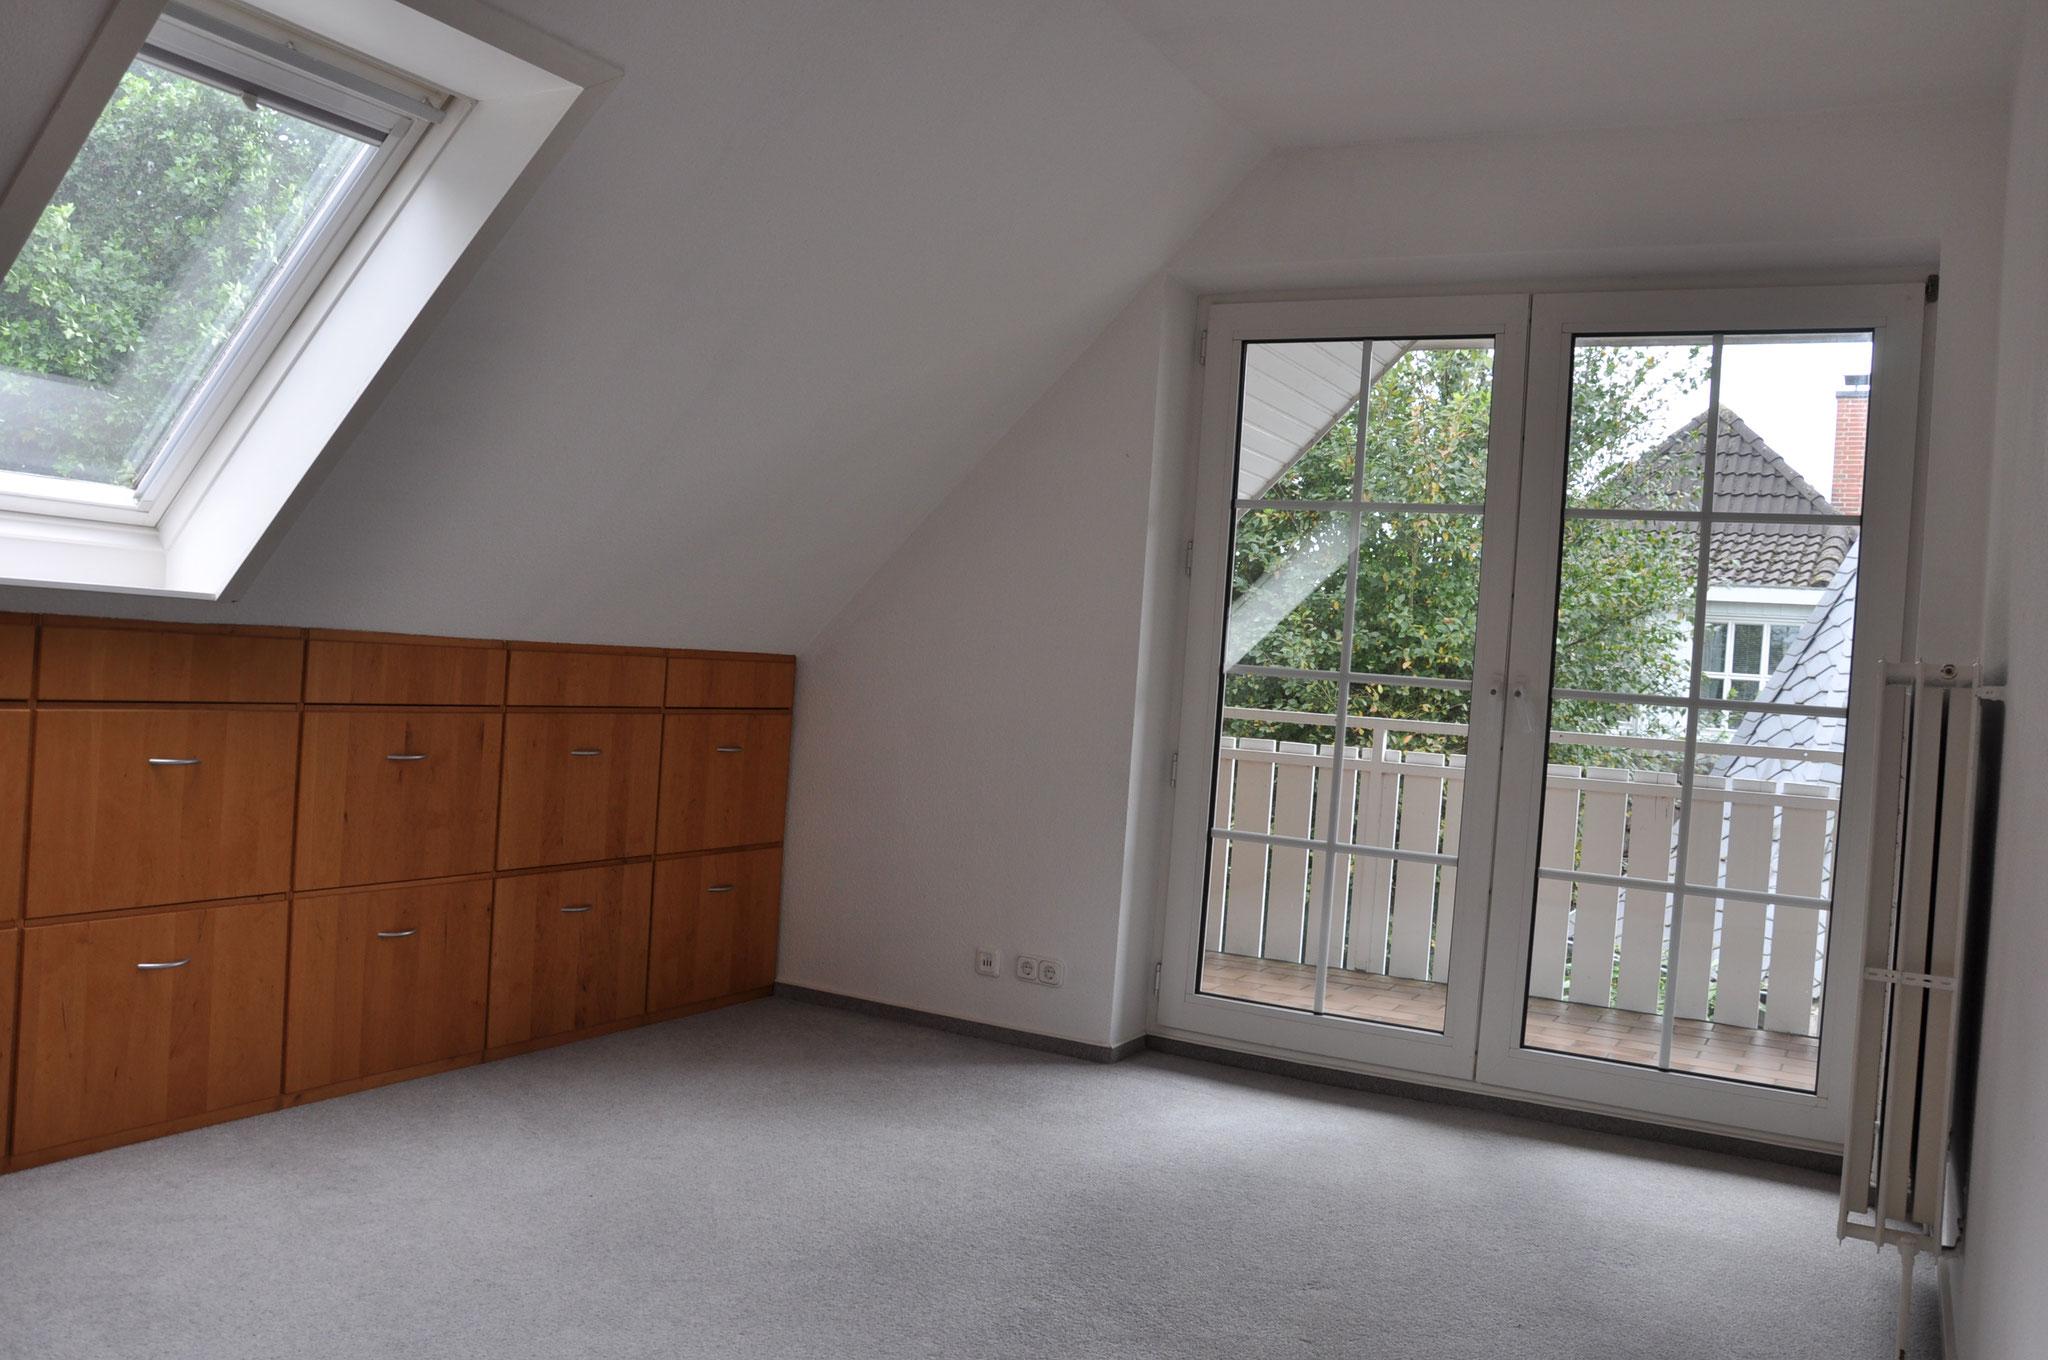 einfamilienhaus im kreis pinneberg optimmo home staging. Black Bedroom Furniture Sets. Home Design Ideas